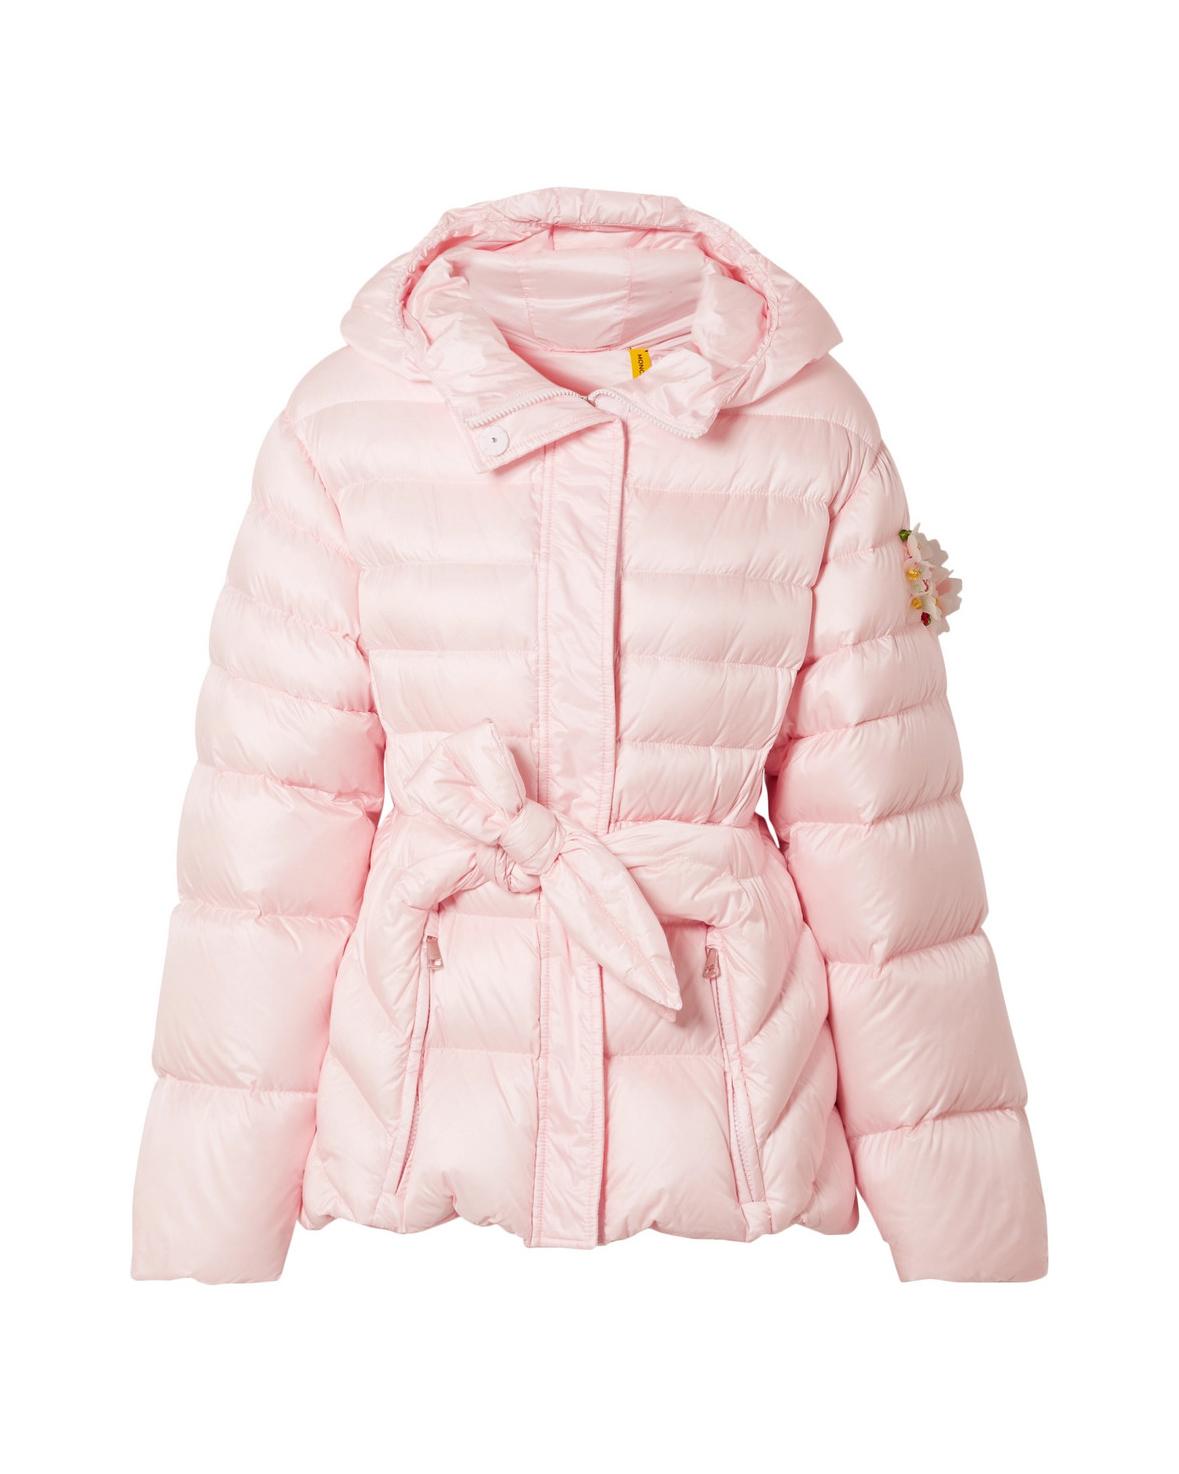 1b5440ce8 Not Just Fluff: The Best Puffer Coats for Winter